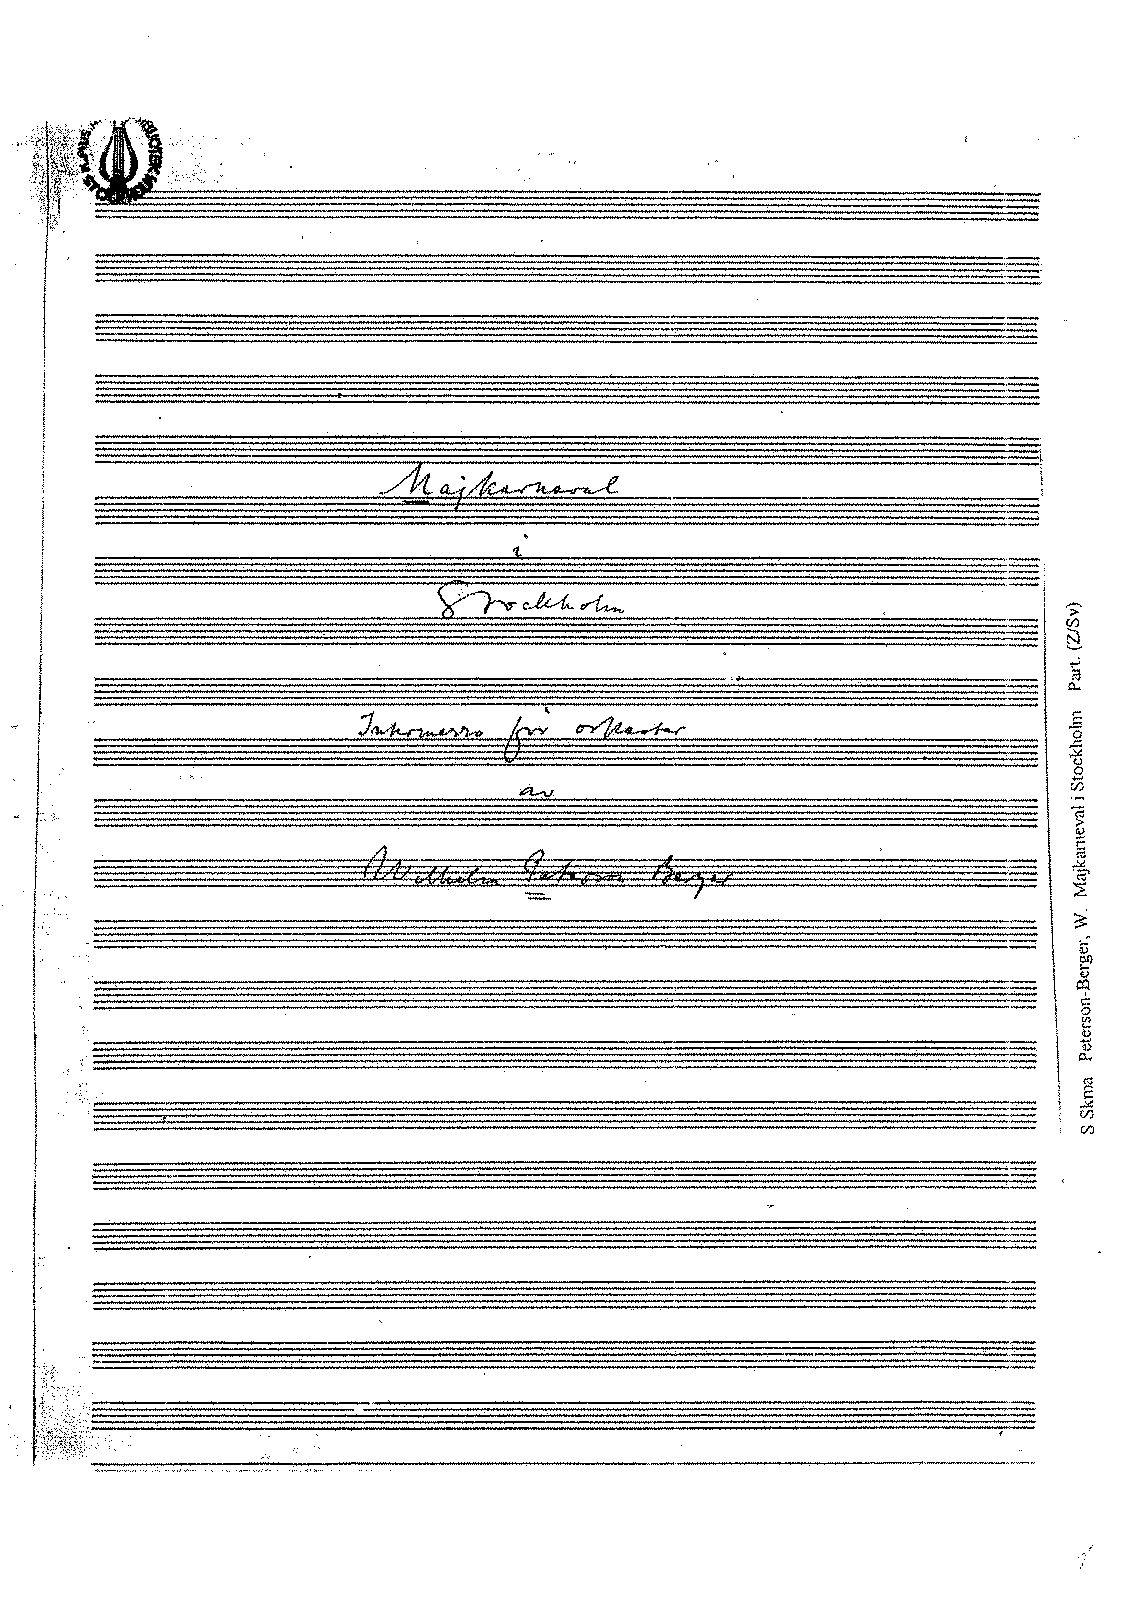 File Pmlp Majkarneval Score